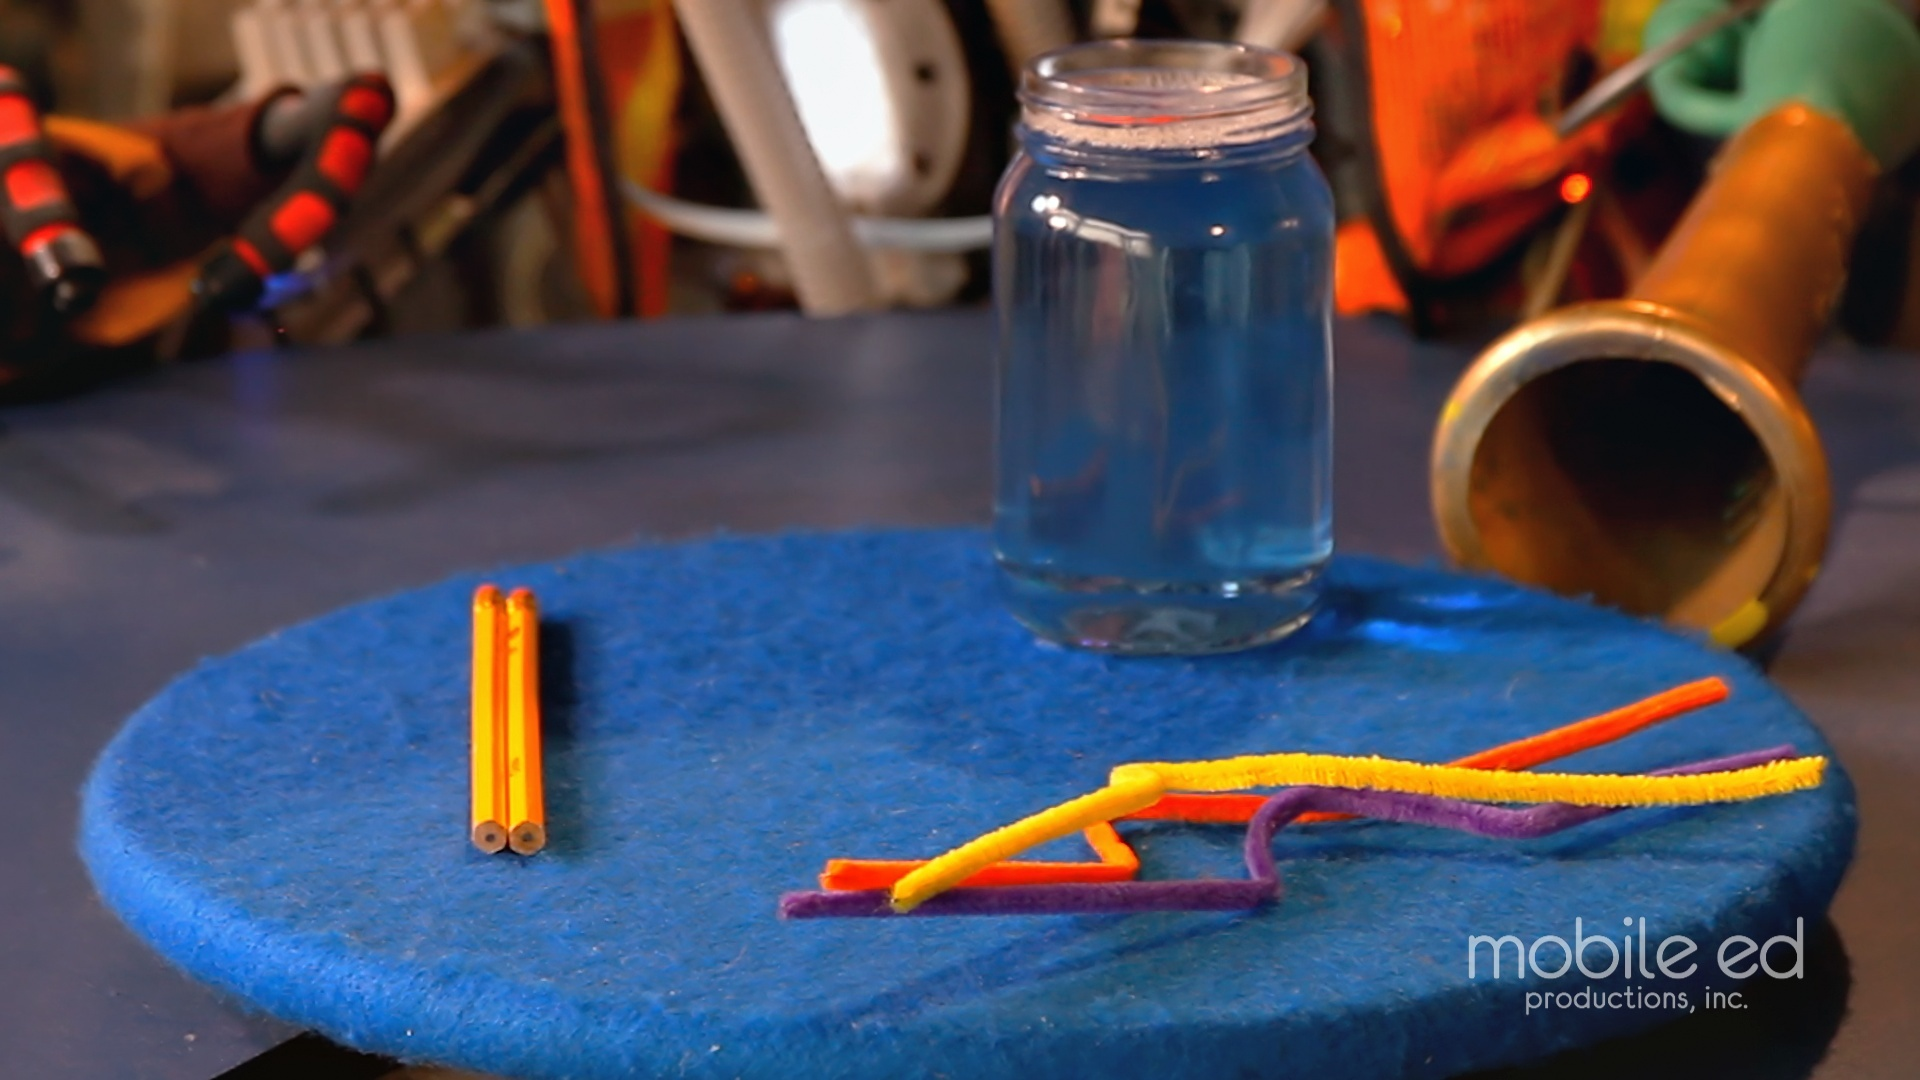 Make Your Own Bubble Wand | Handy Dan the Junkyard Man | Supplies